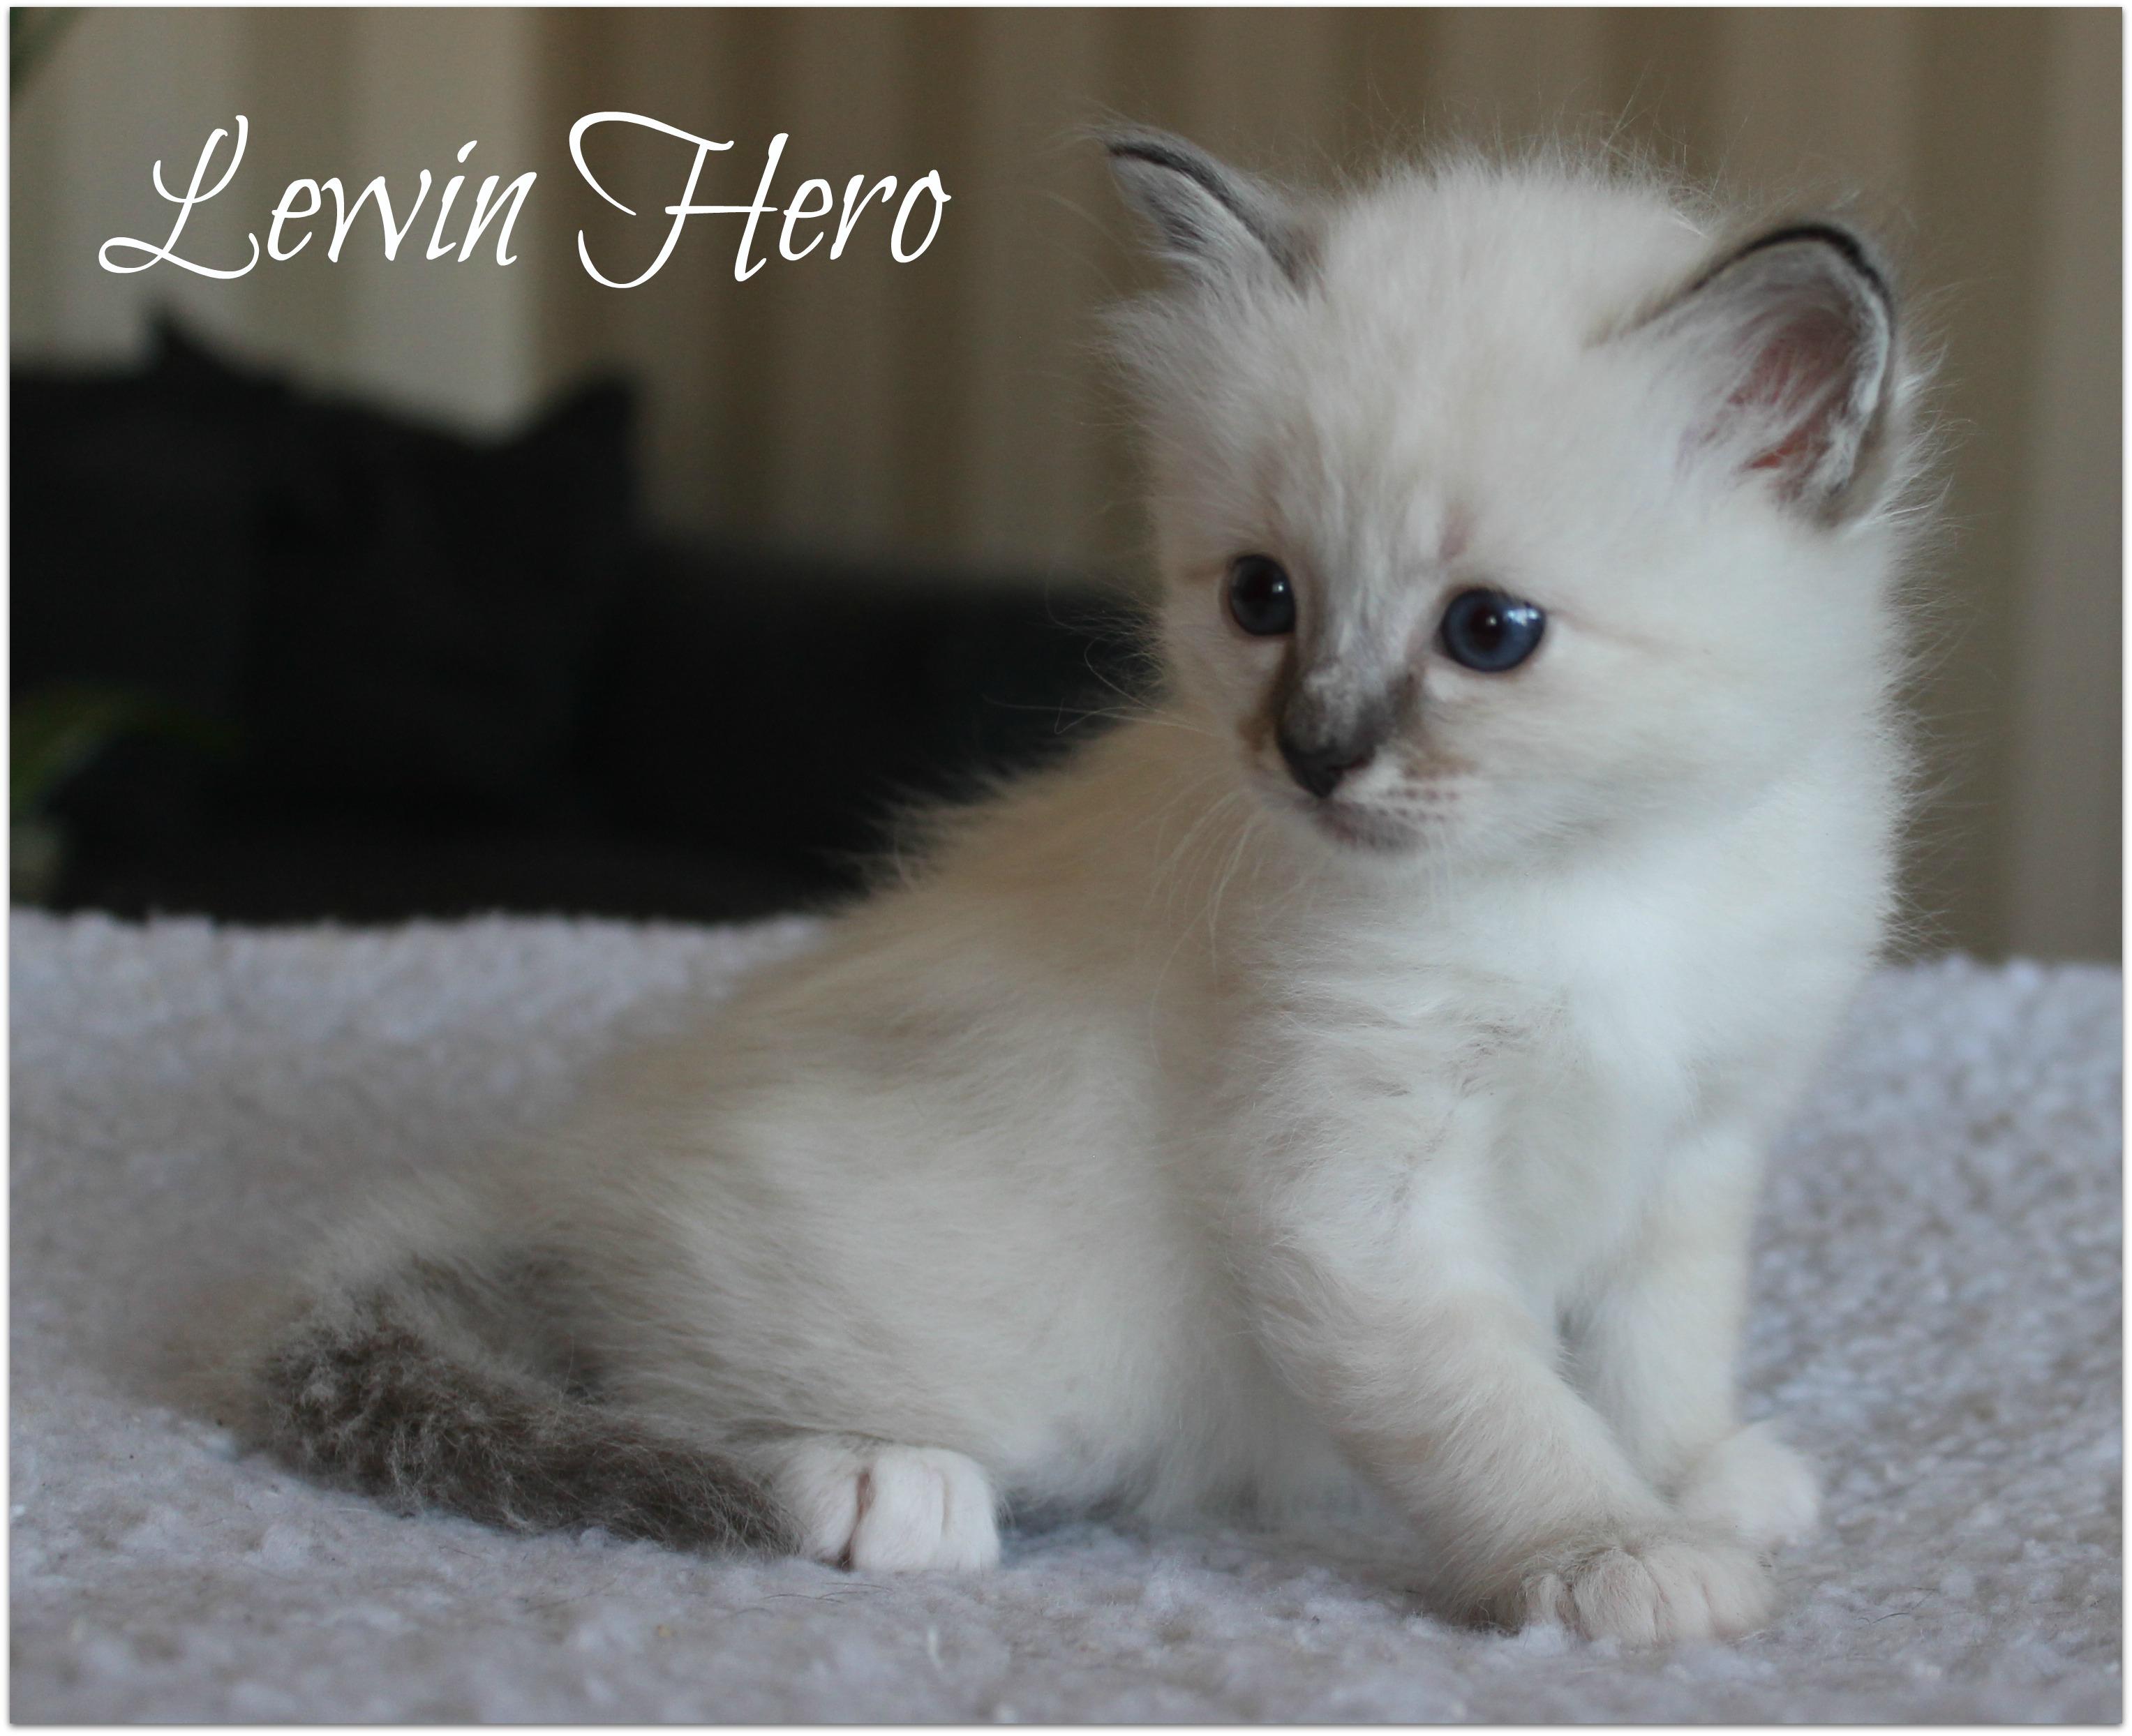 lewin1